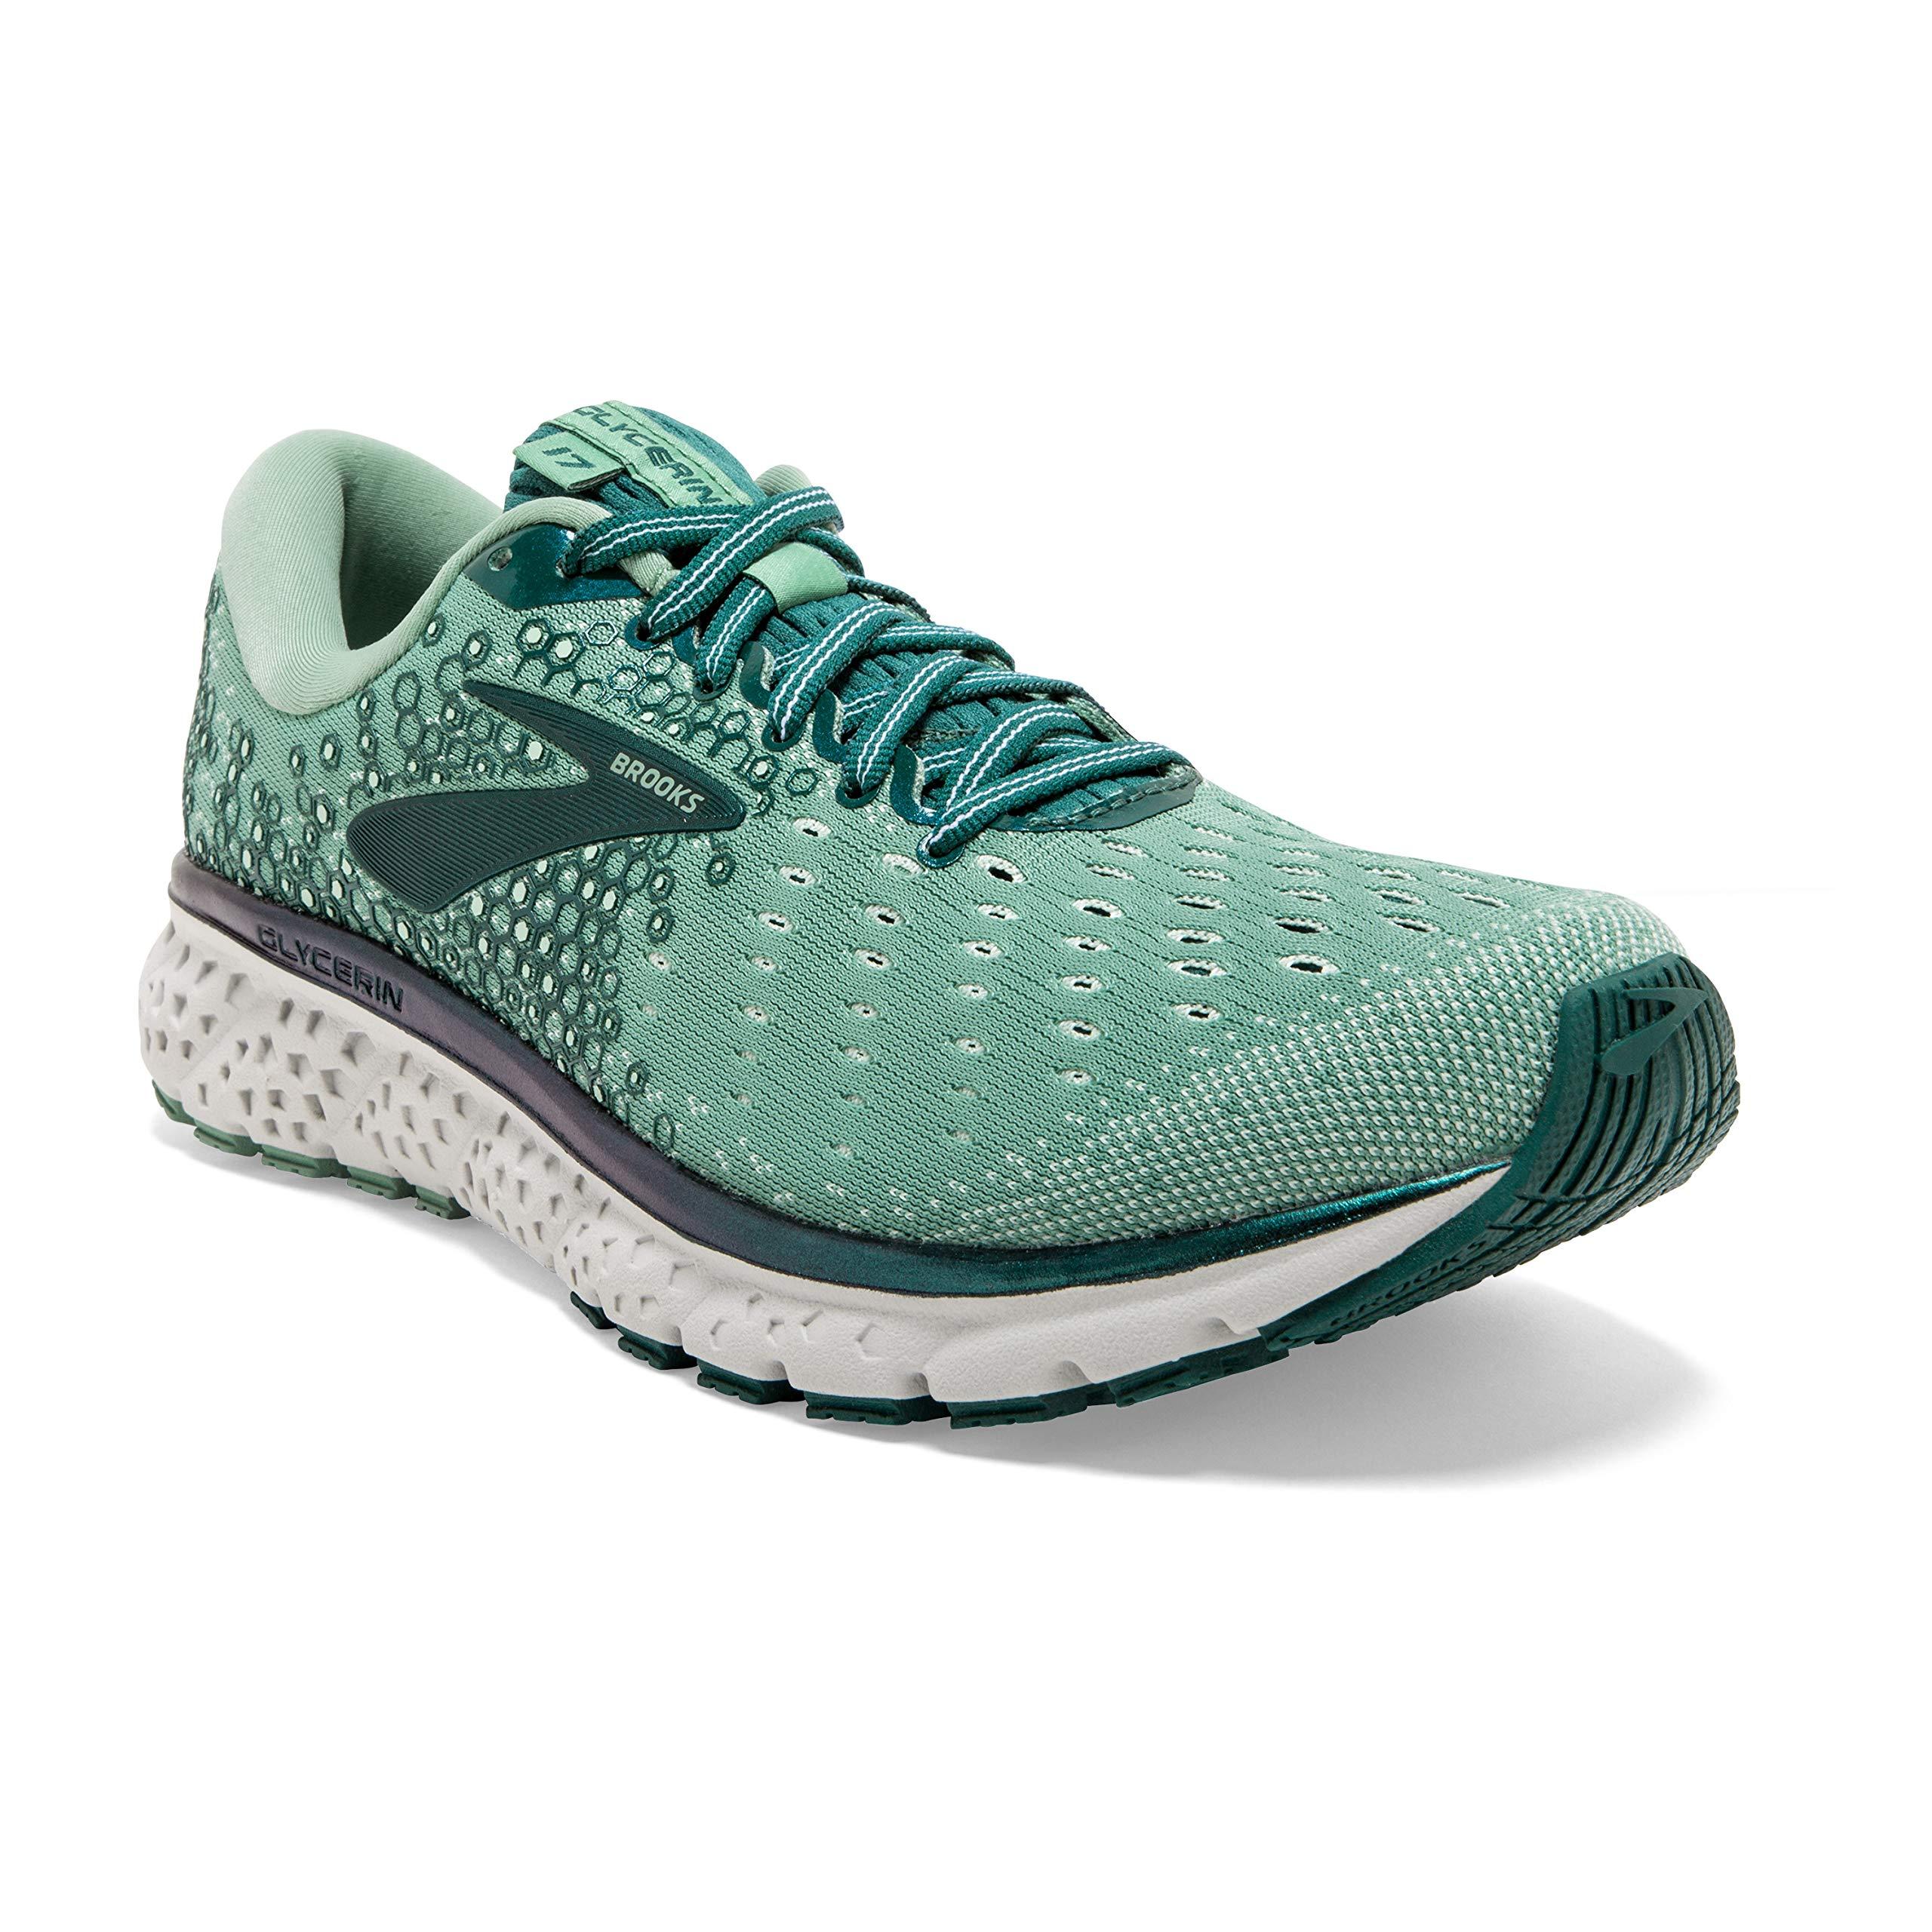 Brooks Womens Glycerin 17 Running Shoe - Feldspar/Aqua Foam/Grey - B - 6.0